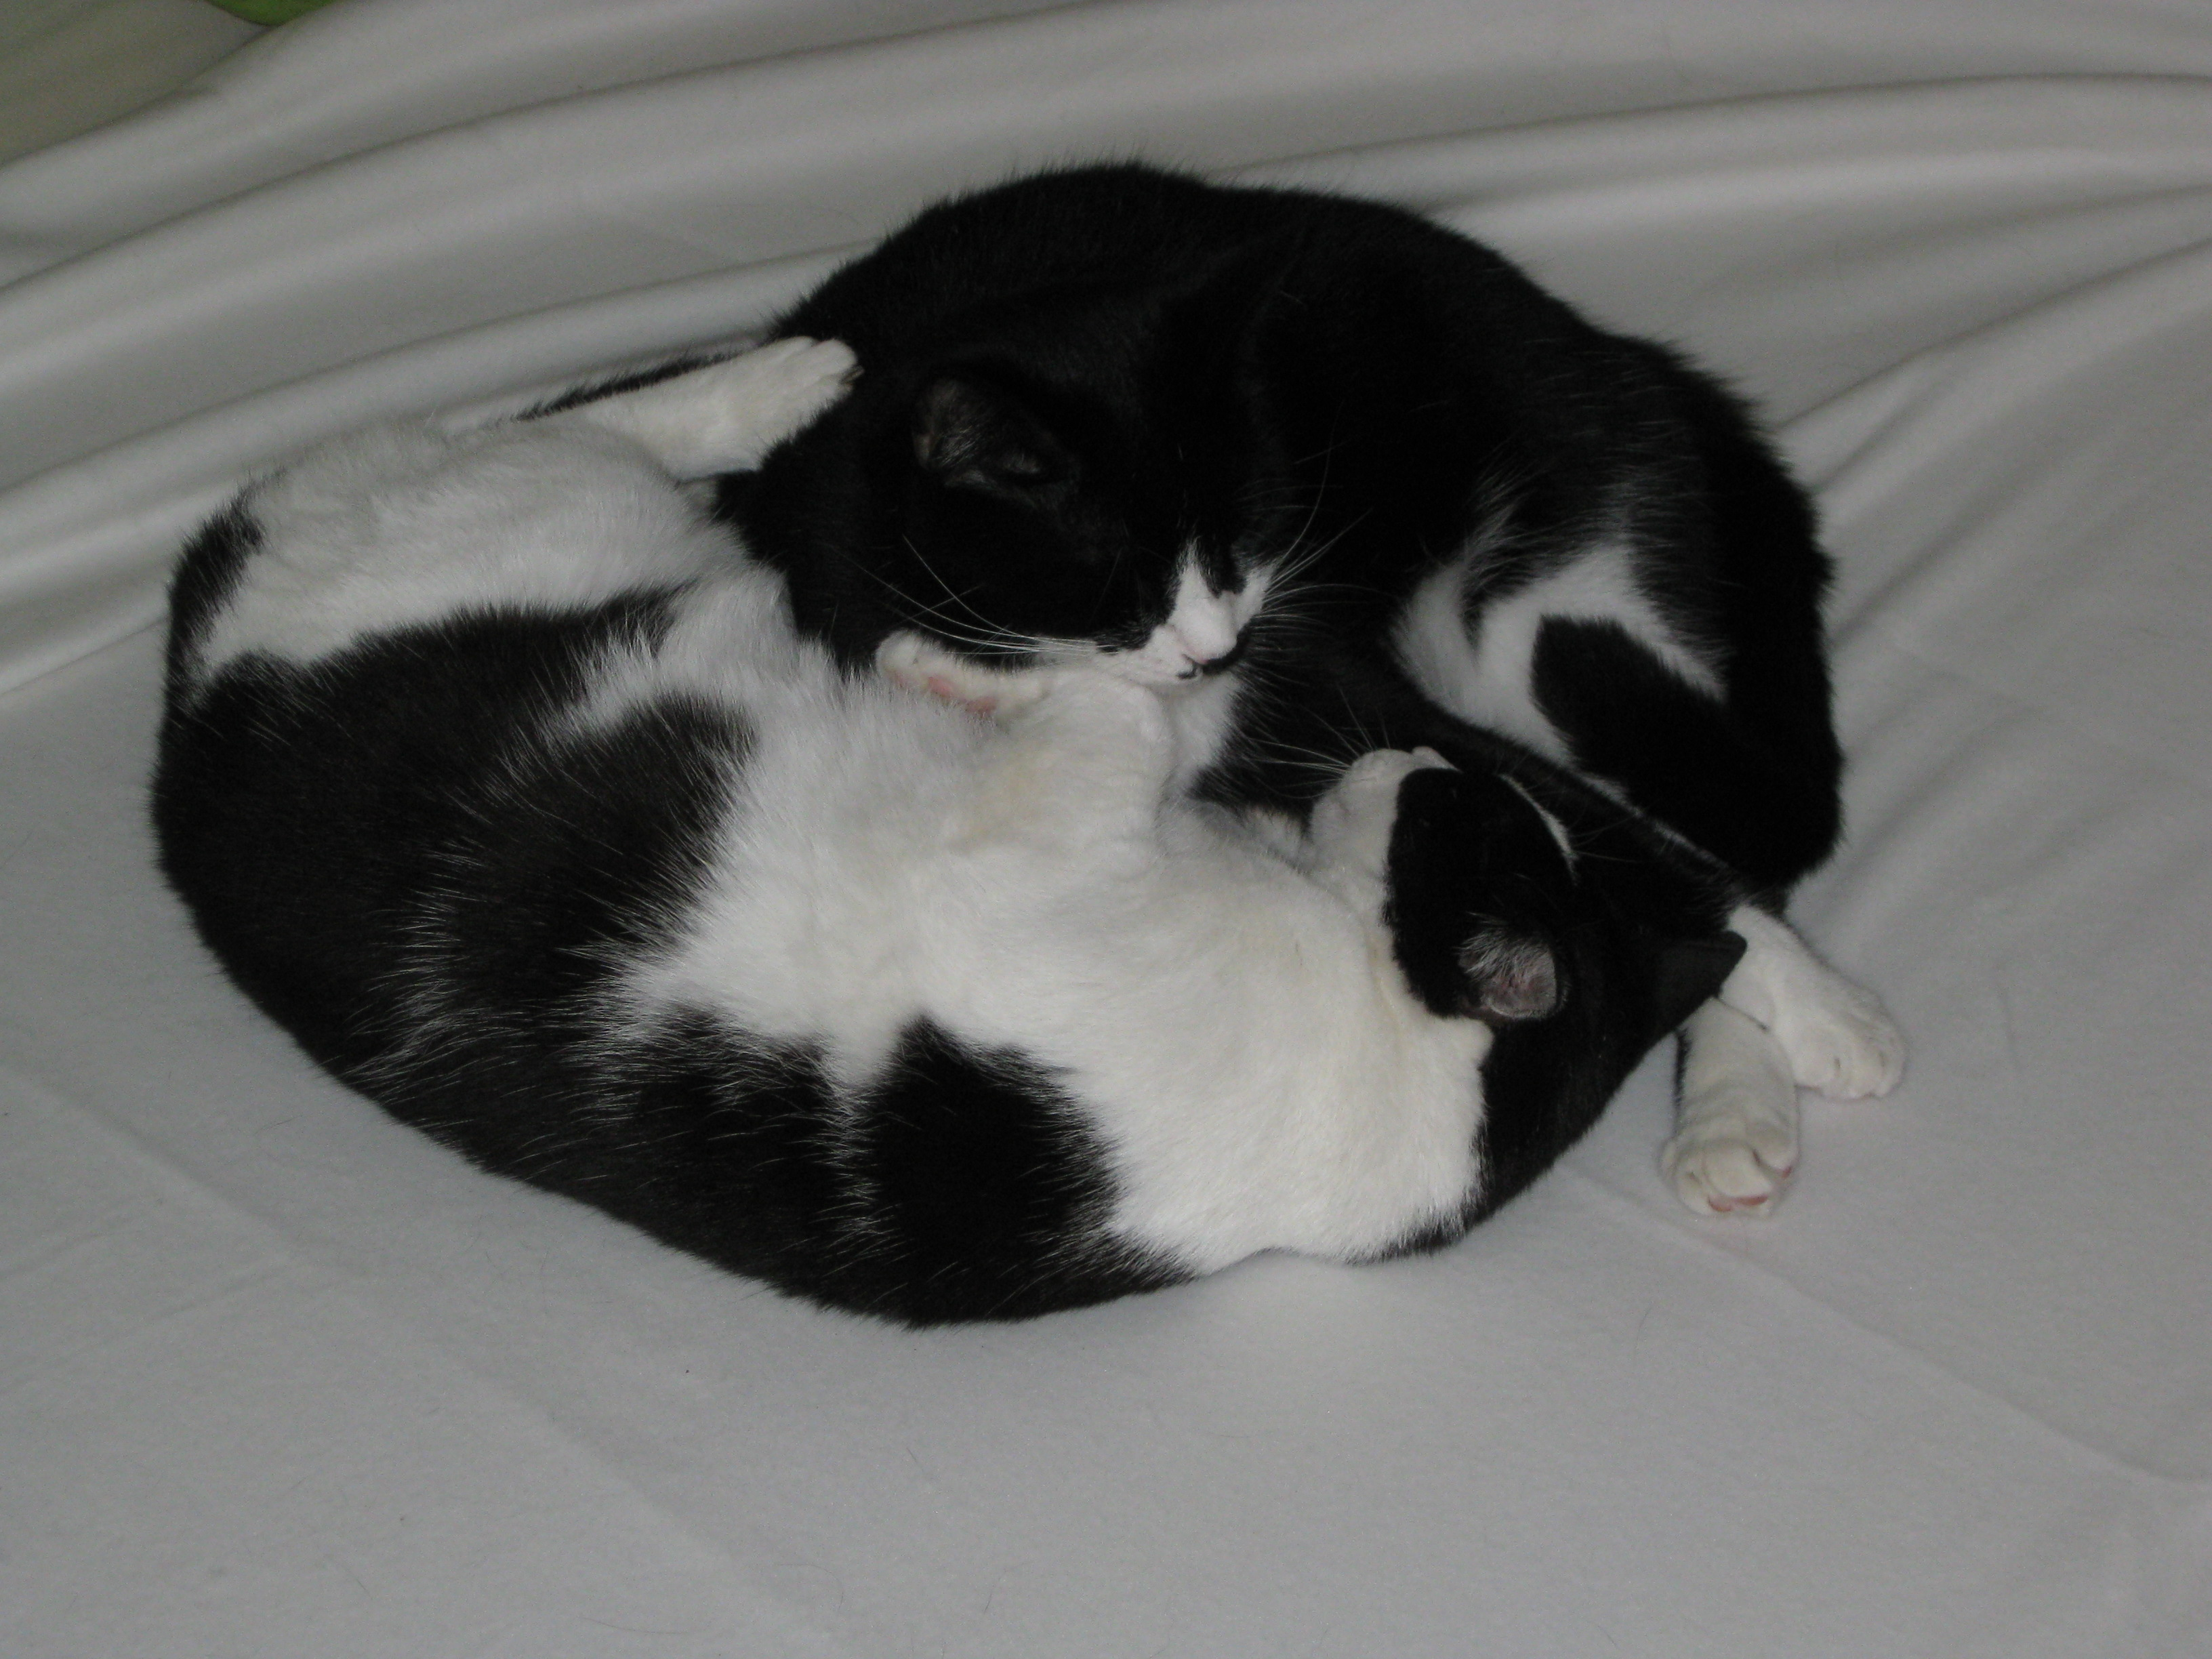 yin und yang bedeutung welche rolle spielt die yin yang. Black Bedroom Furniture Sets. Home Design Ideas